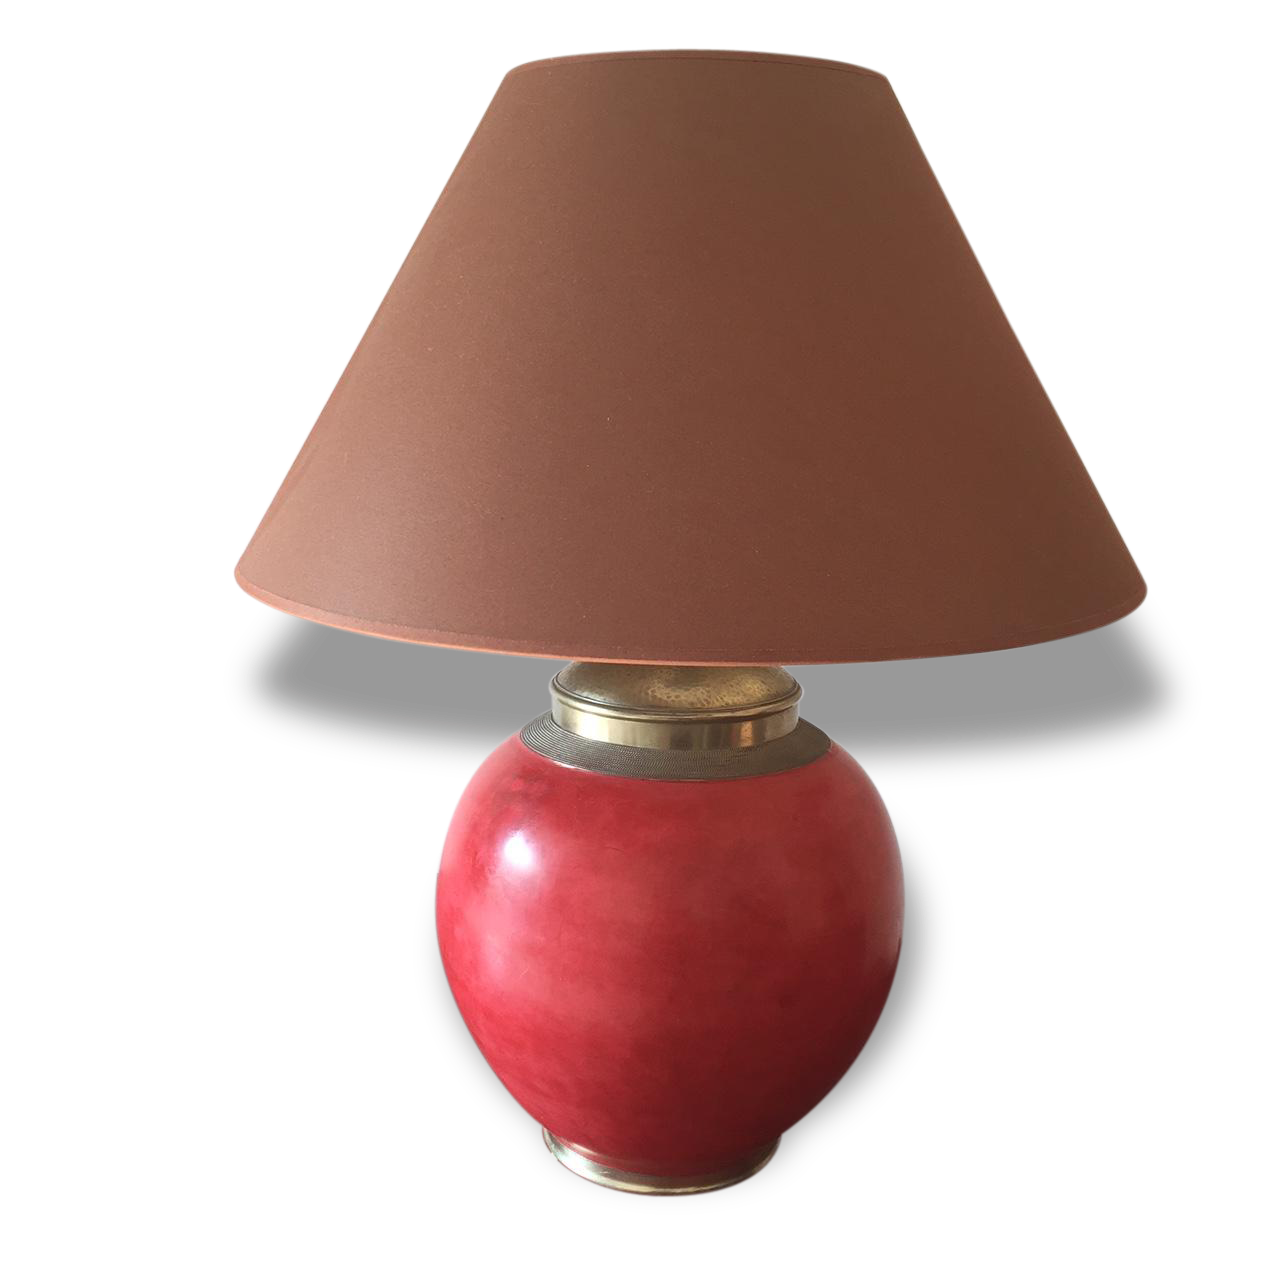 Lampe En Tadelakt Marocaine Rouge / Marron